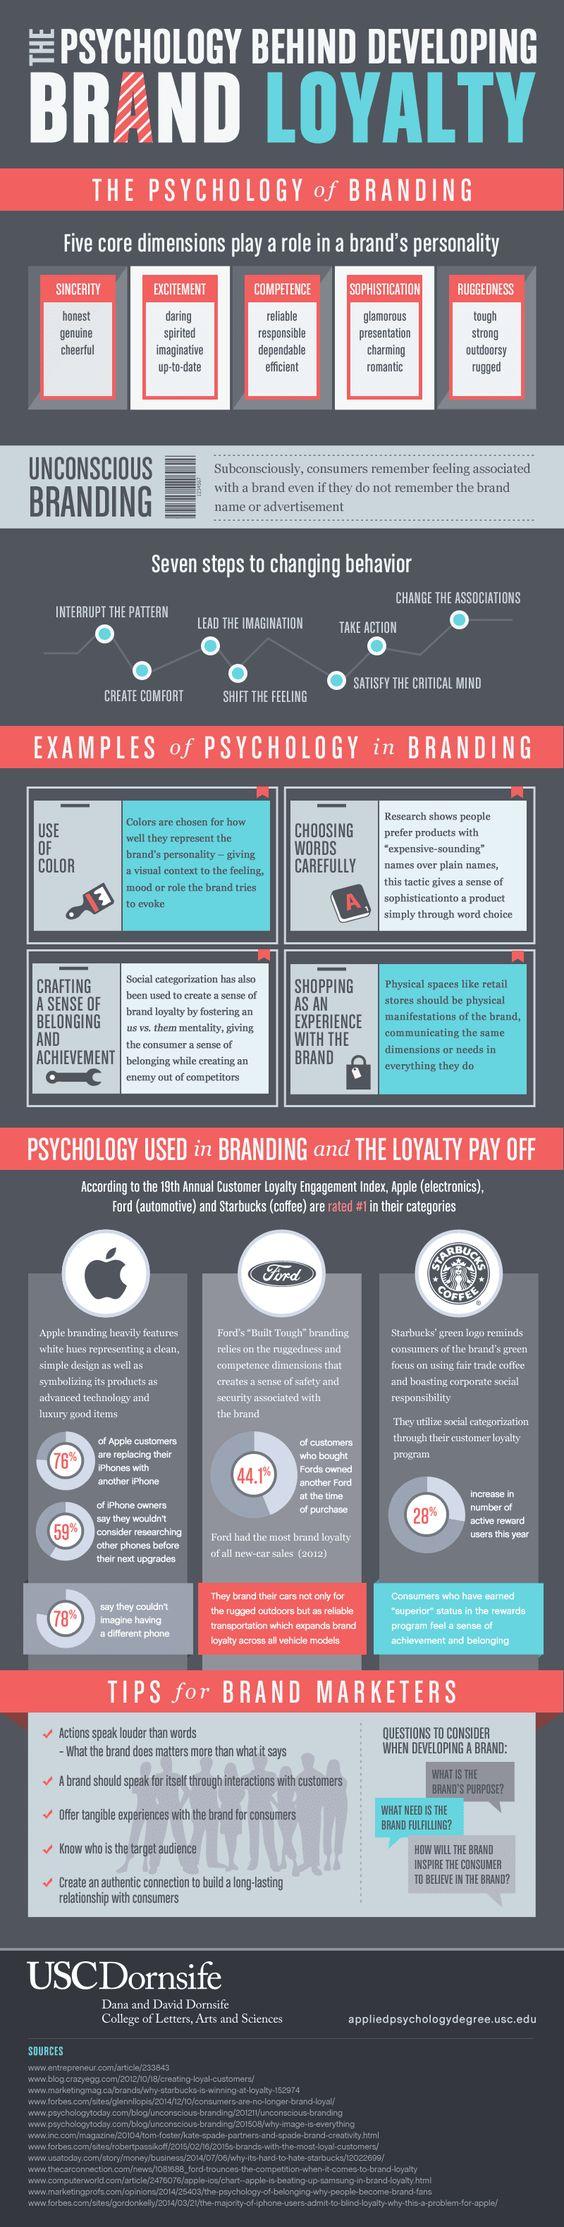 Brand loyalty infographic - Netreputation